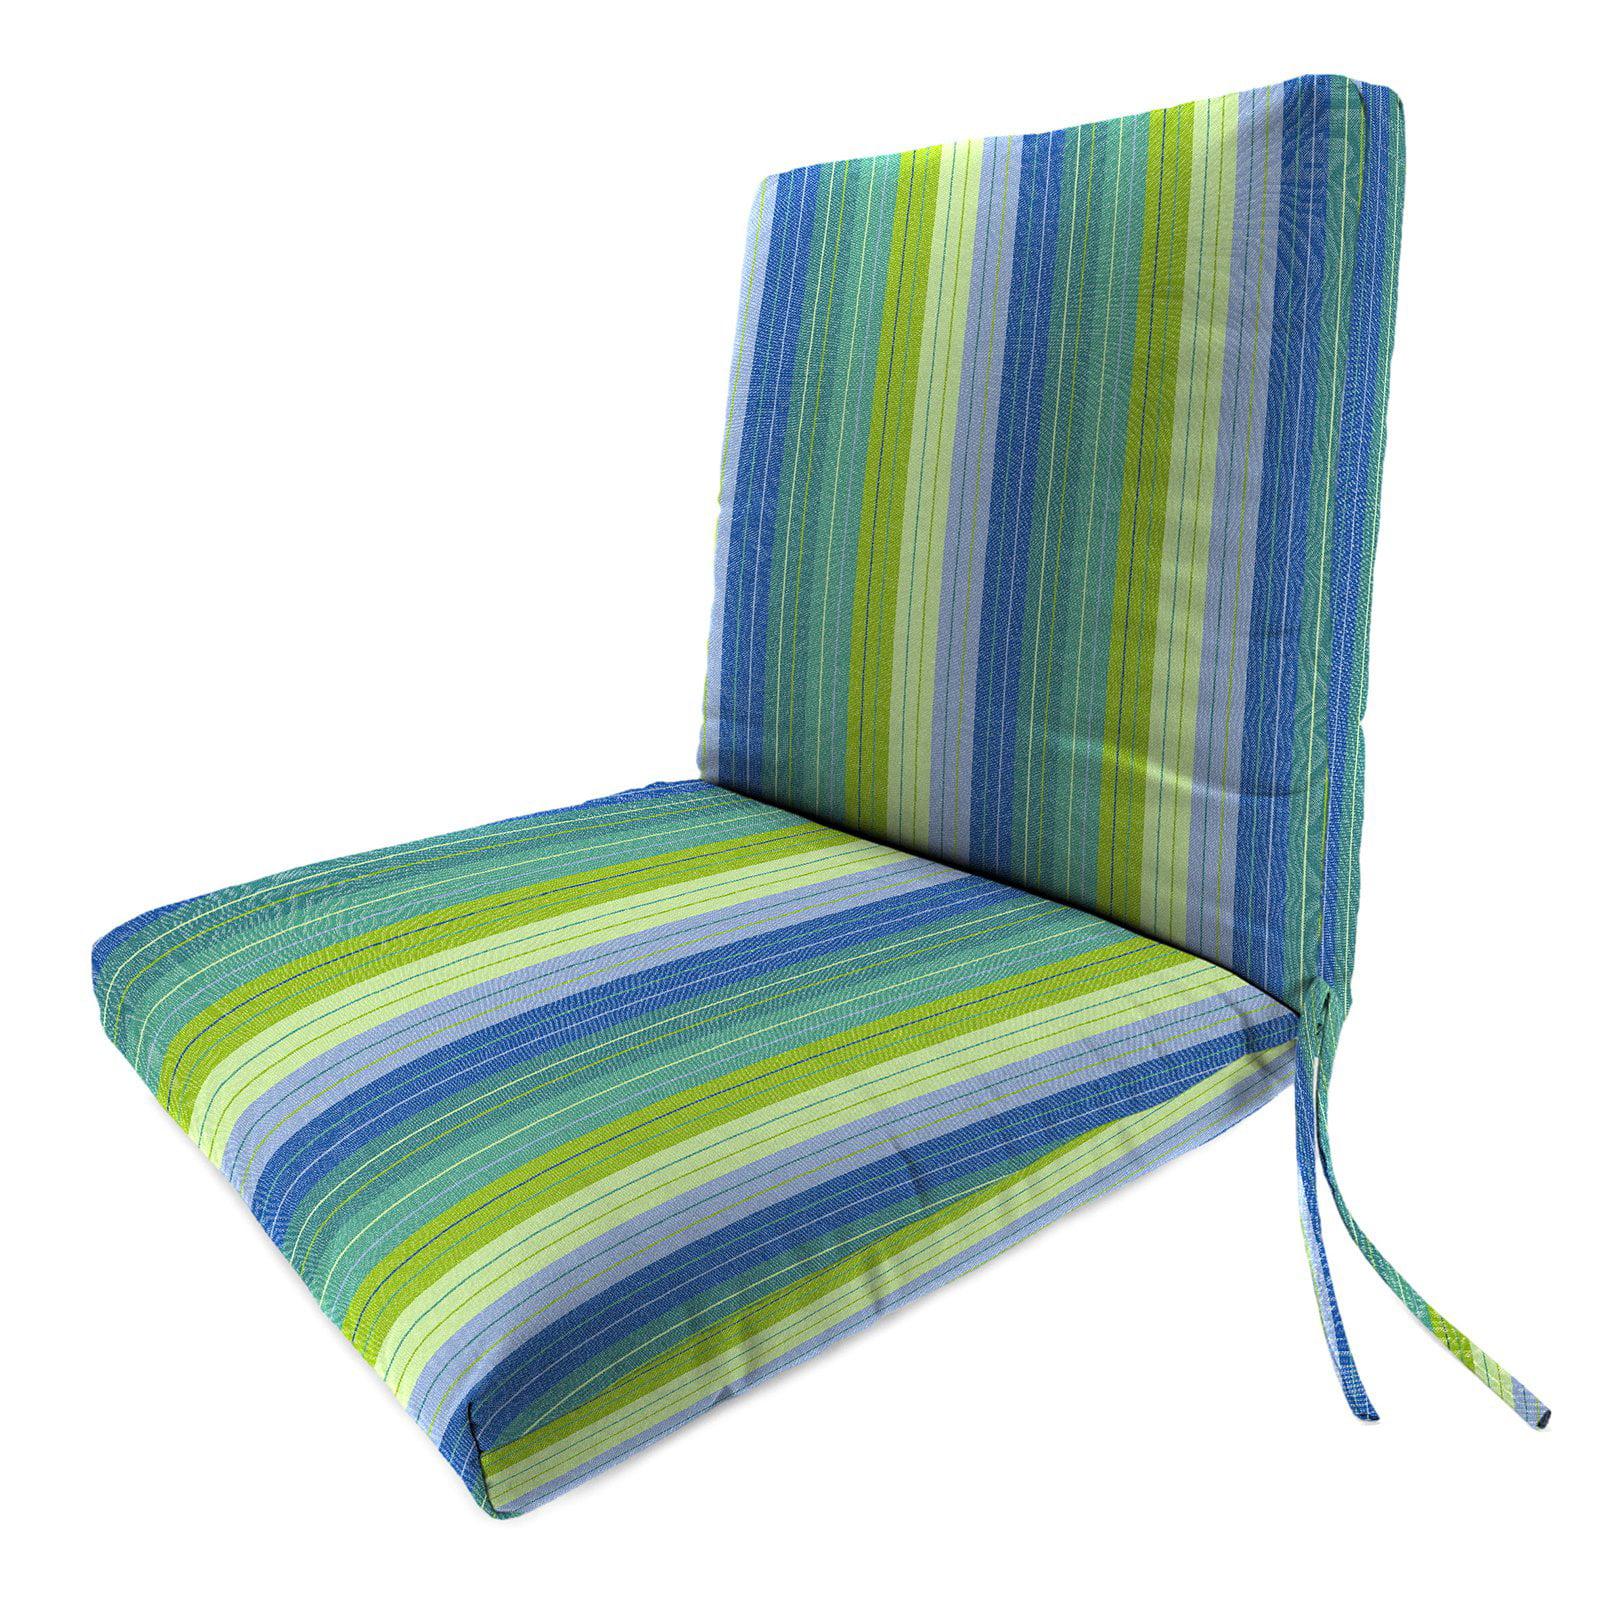 Jordan Manufacturing Sunbrella 44 x 22 in. Dining Chair Cushion